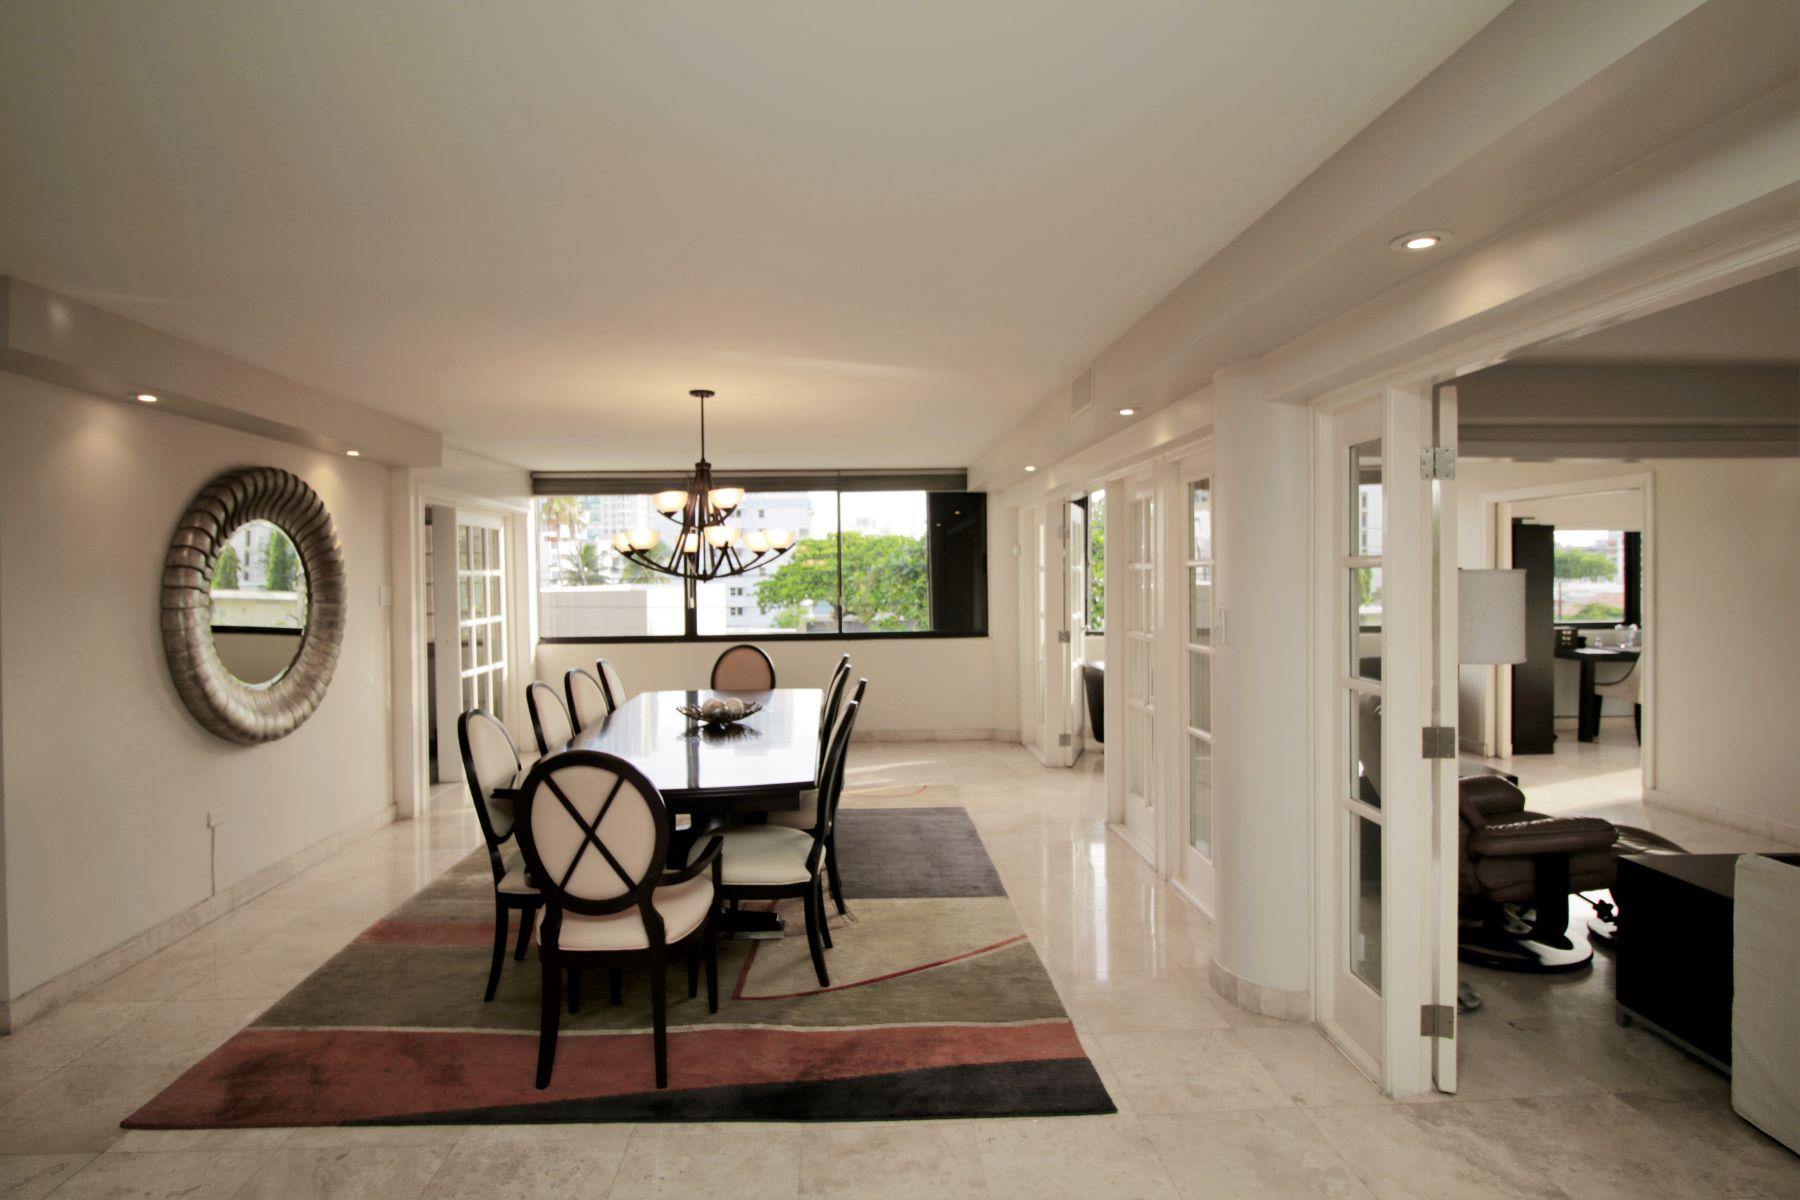 Additional photo for property listing at Expansive Three Bed Rental at La Ceiba 1483 Avenida Ashford Apt 402 San Juan, Puerto Rico 00907 Porto Rico